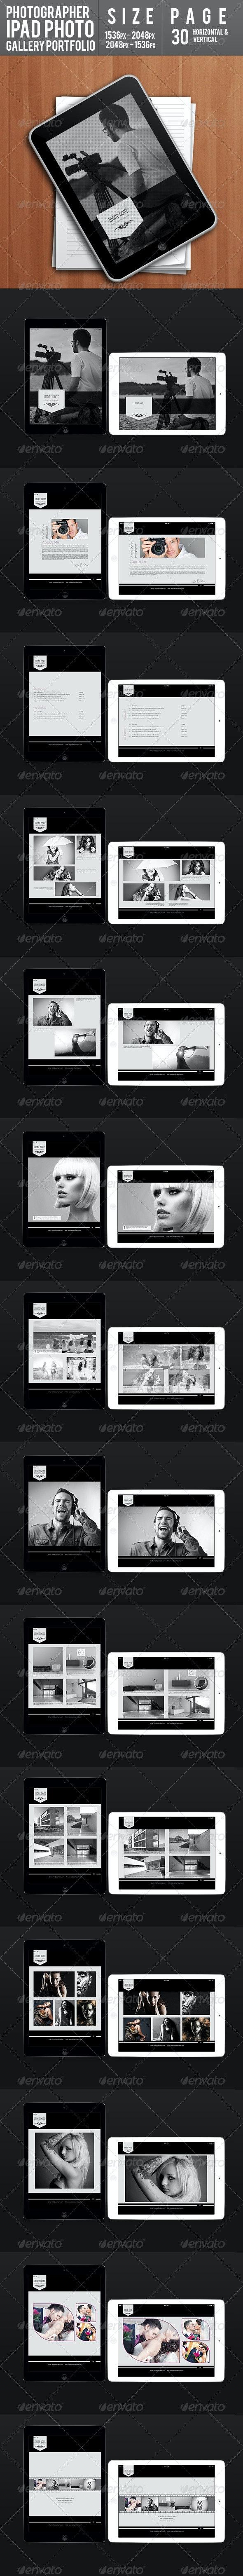 Photographer Ipad Photo Gallery Portfolio